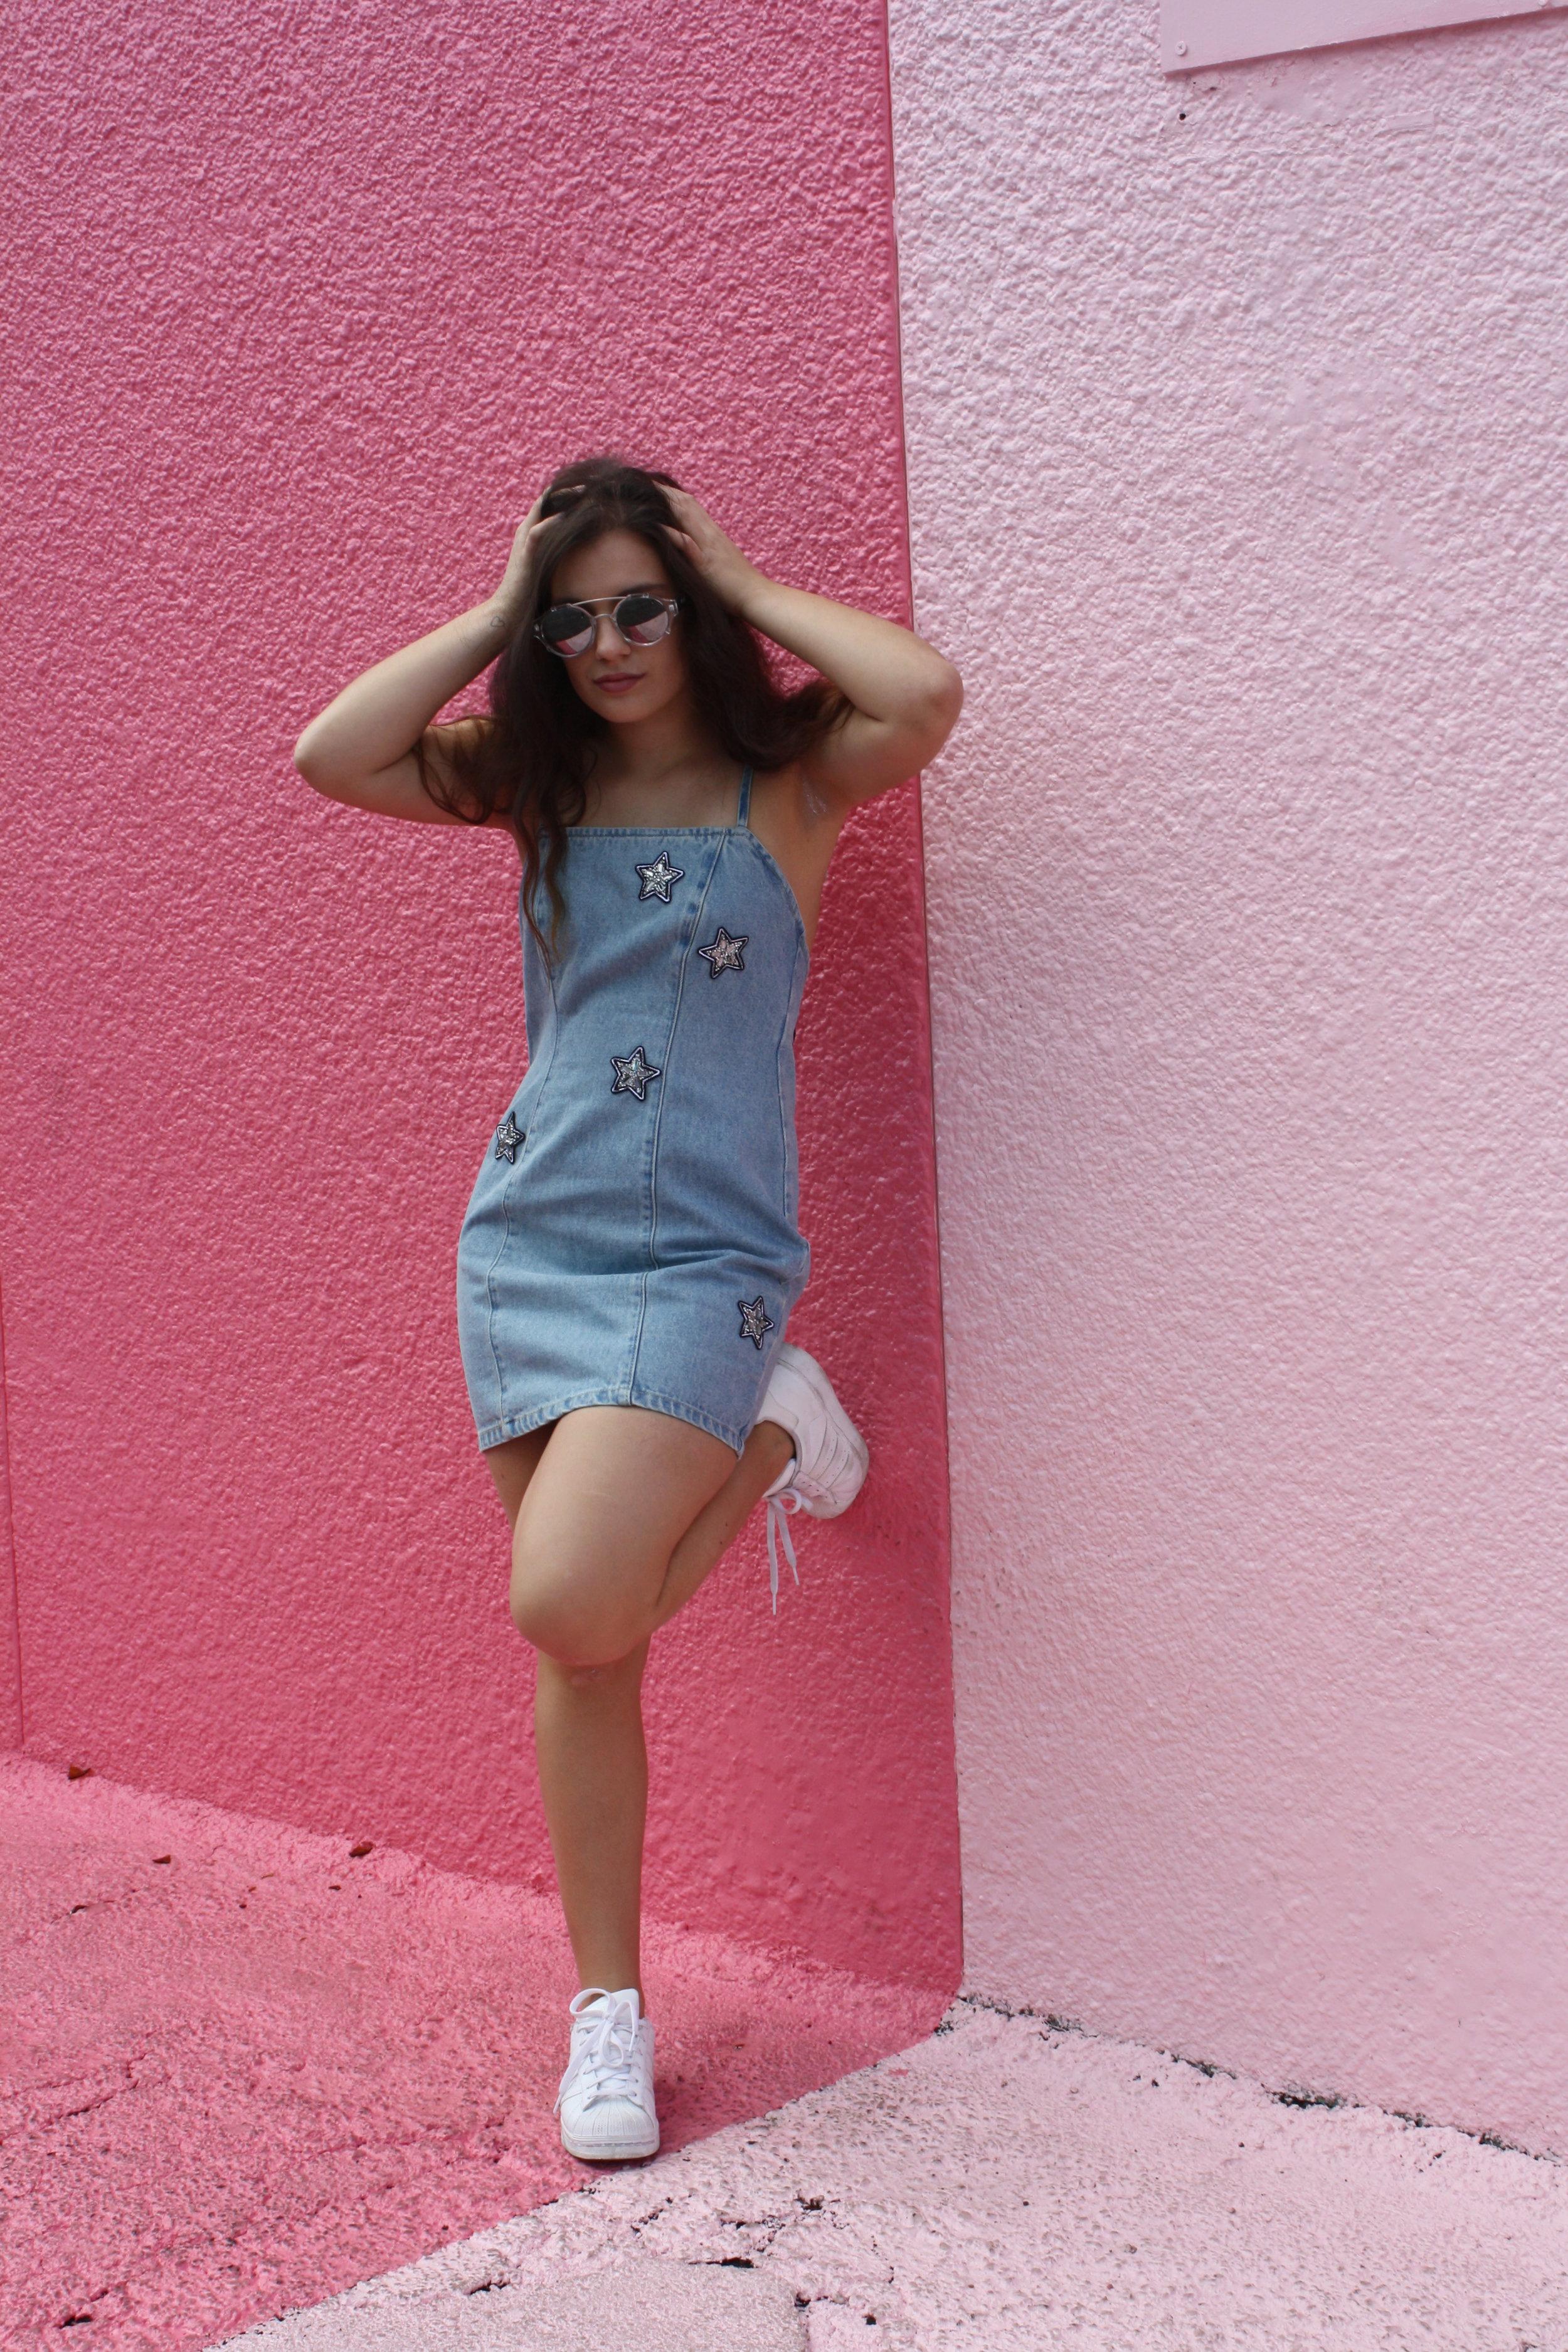 Dress: MINKPINK, Shoes: Adidas, Sunglasses: Quay